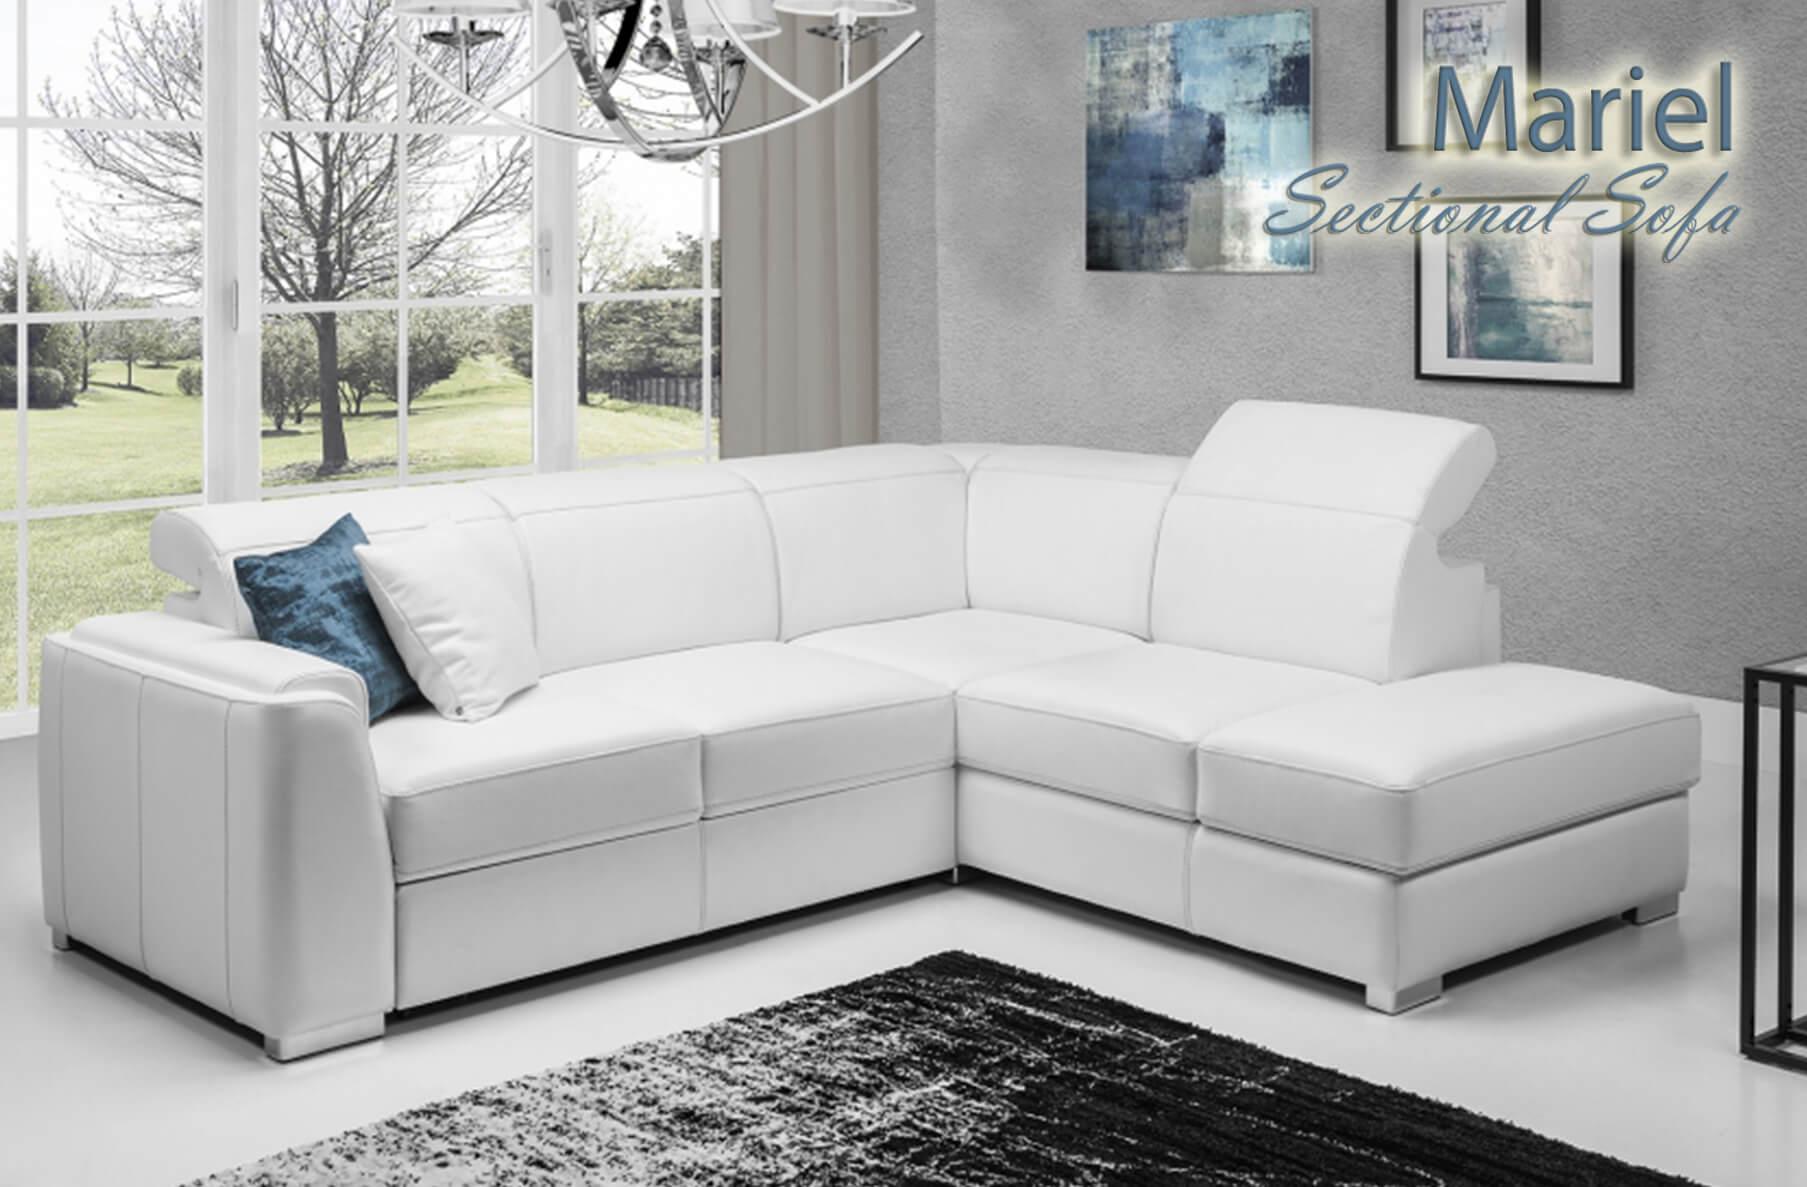 Mariel Sectional Sofa, Cheap